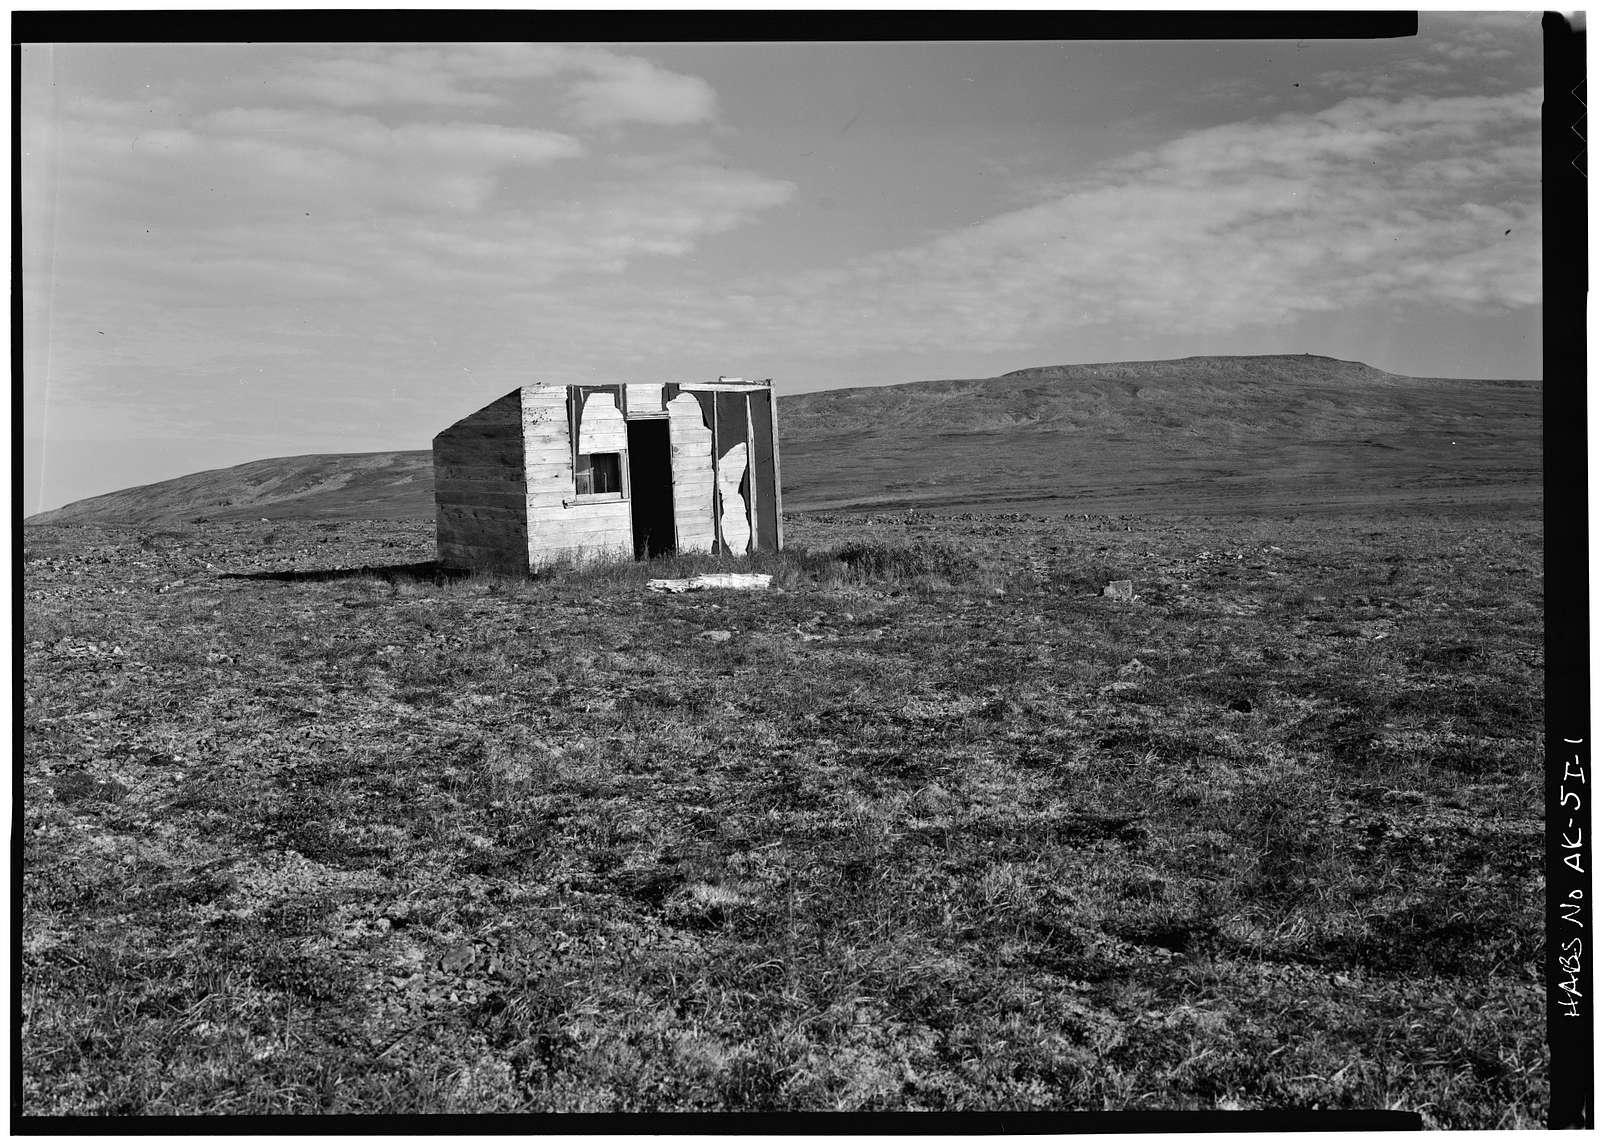 Iditarod Trail Shelter Cabins, Summit Shelter Cabin, Skwentna, Matanuska-Susitna Borough, AK